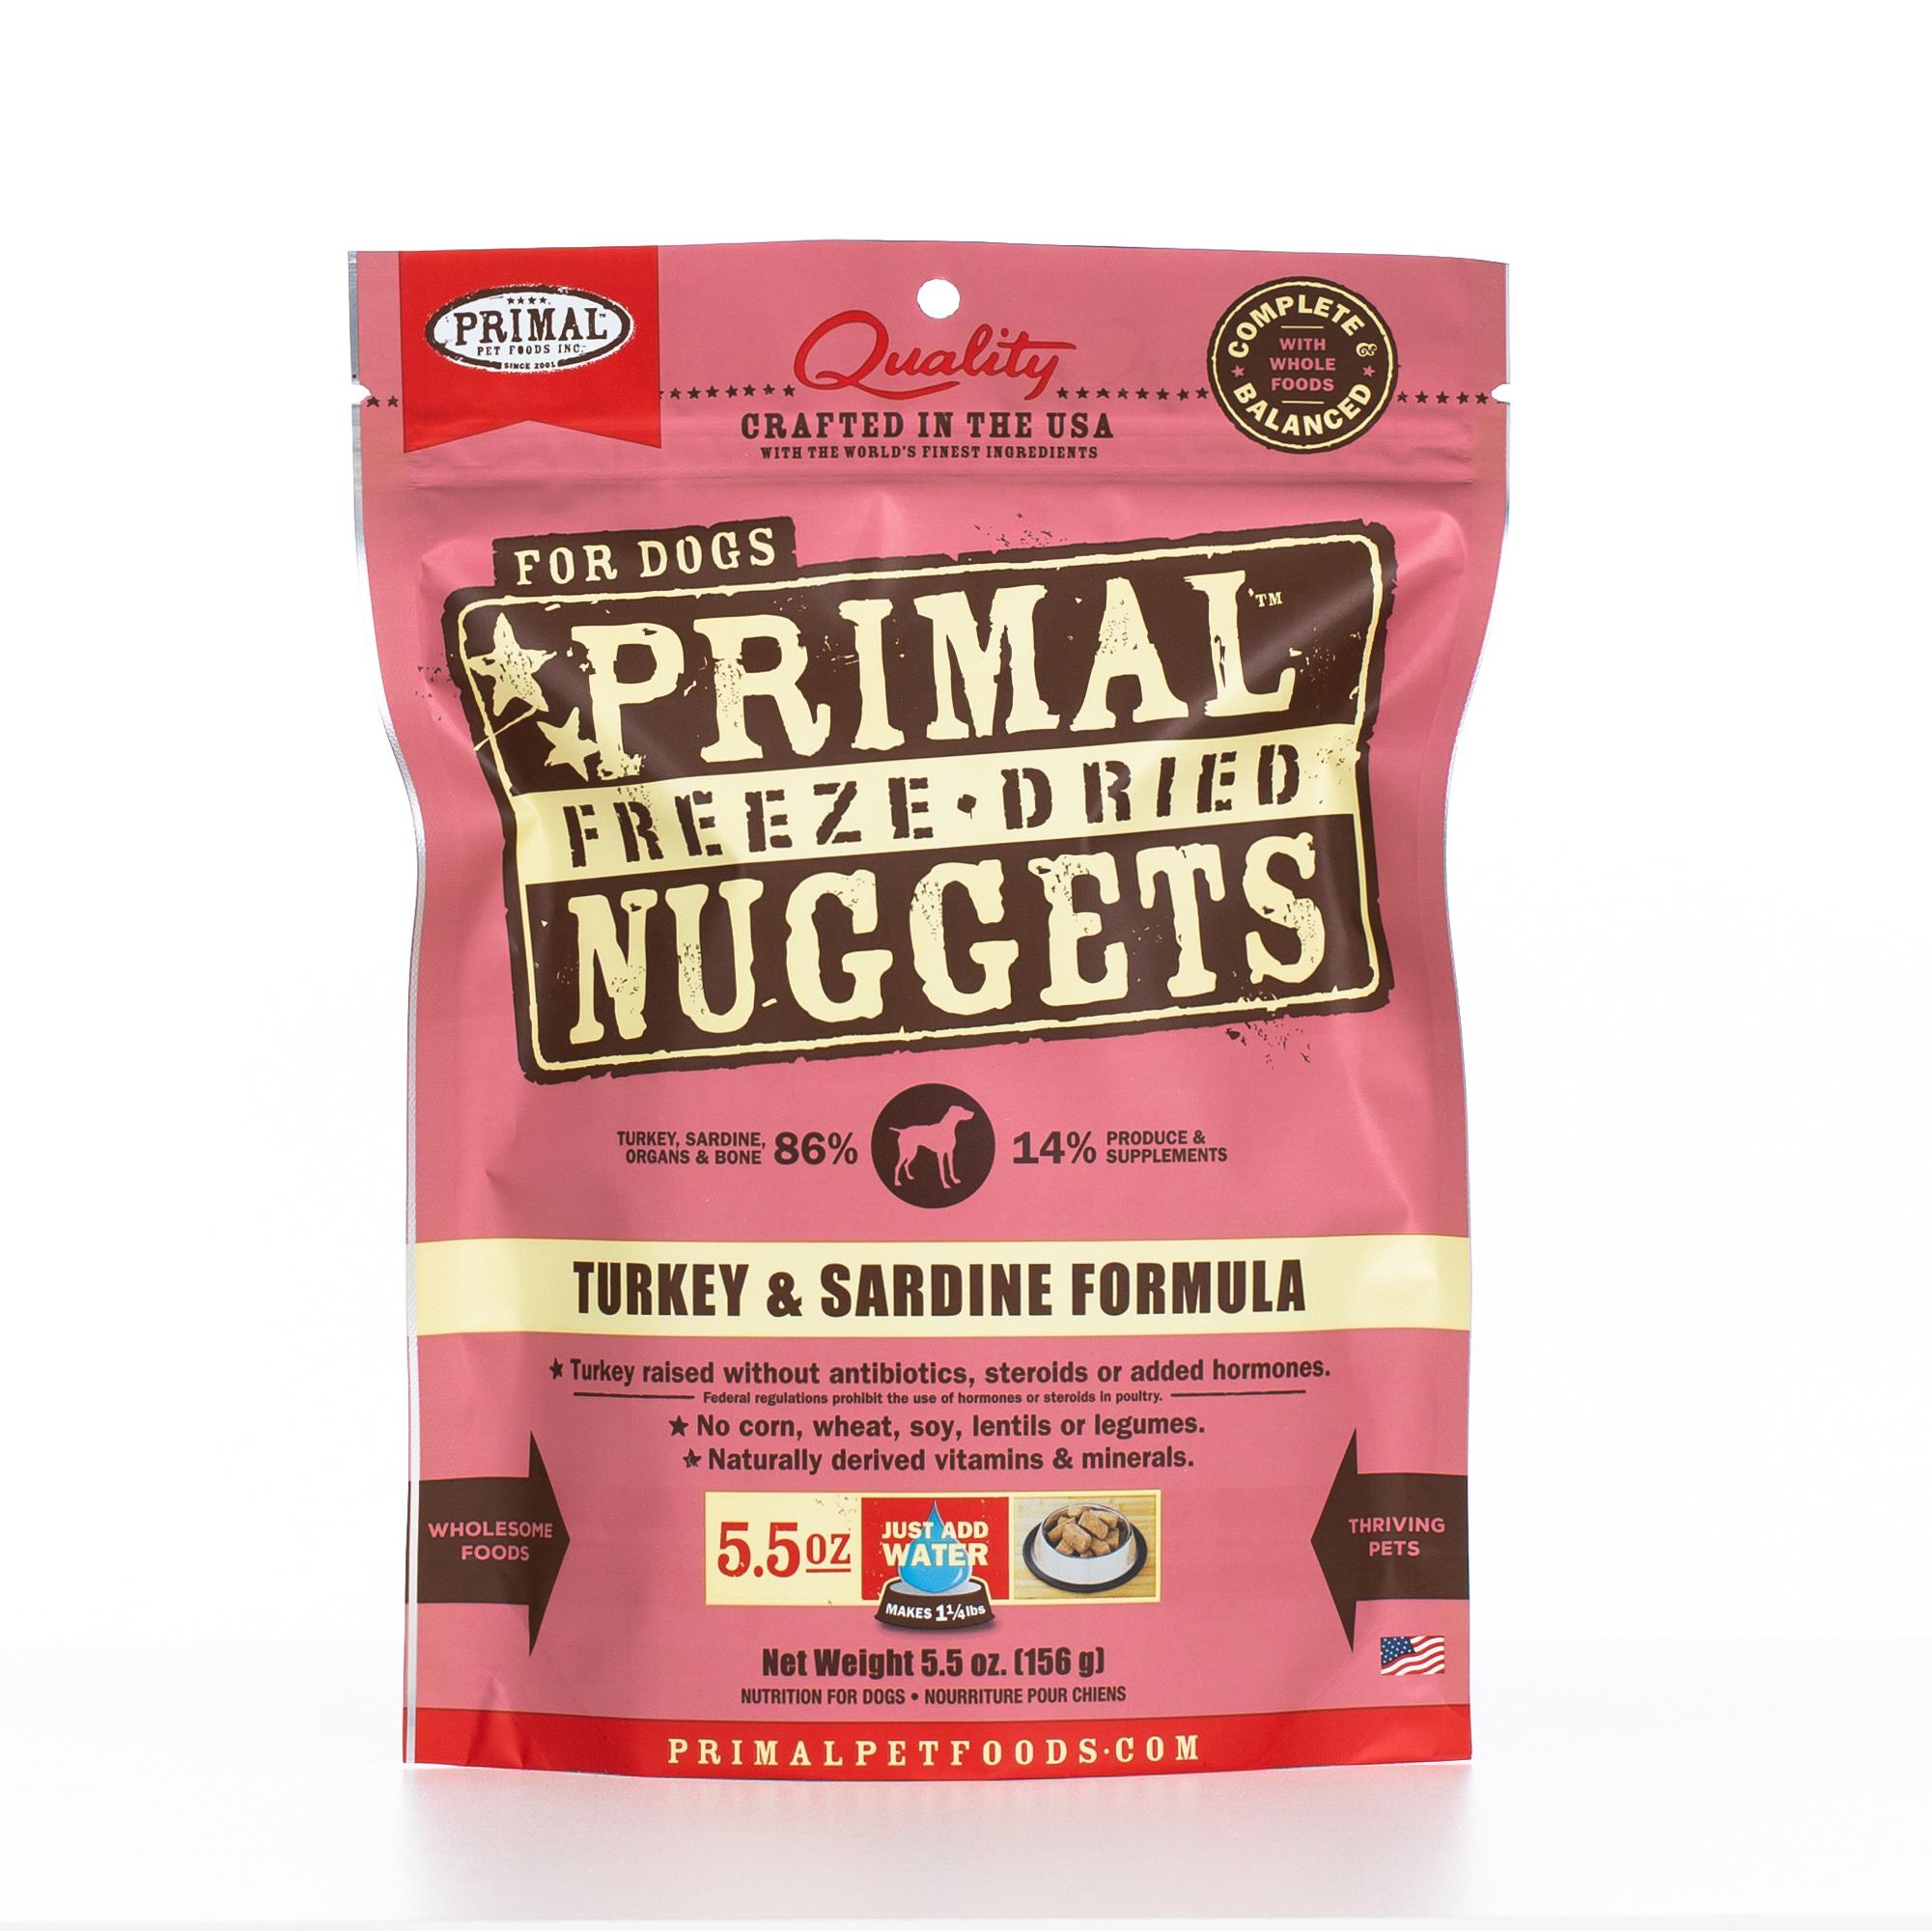 Primal Raw Freeze-Dried Nuggets Turkey & Sardine Formula Dog Food Image